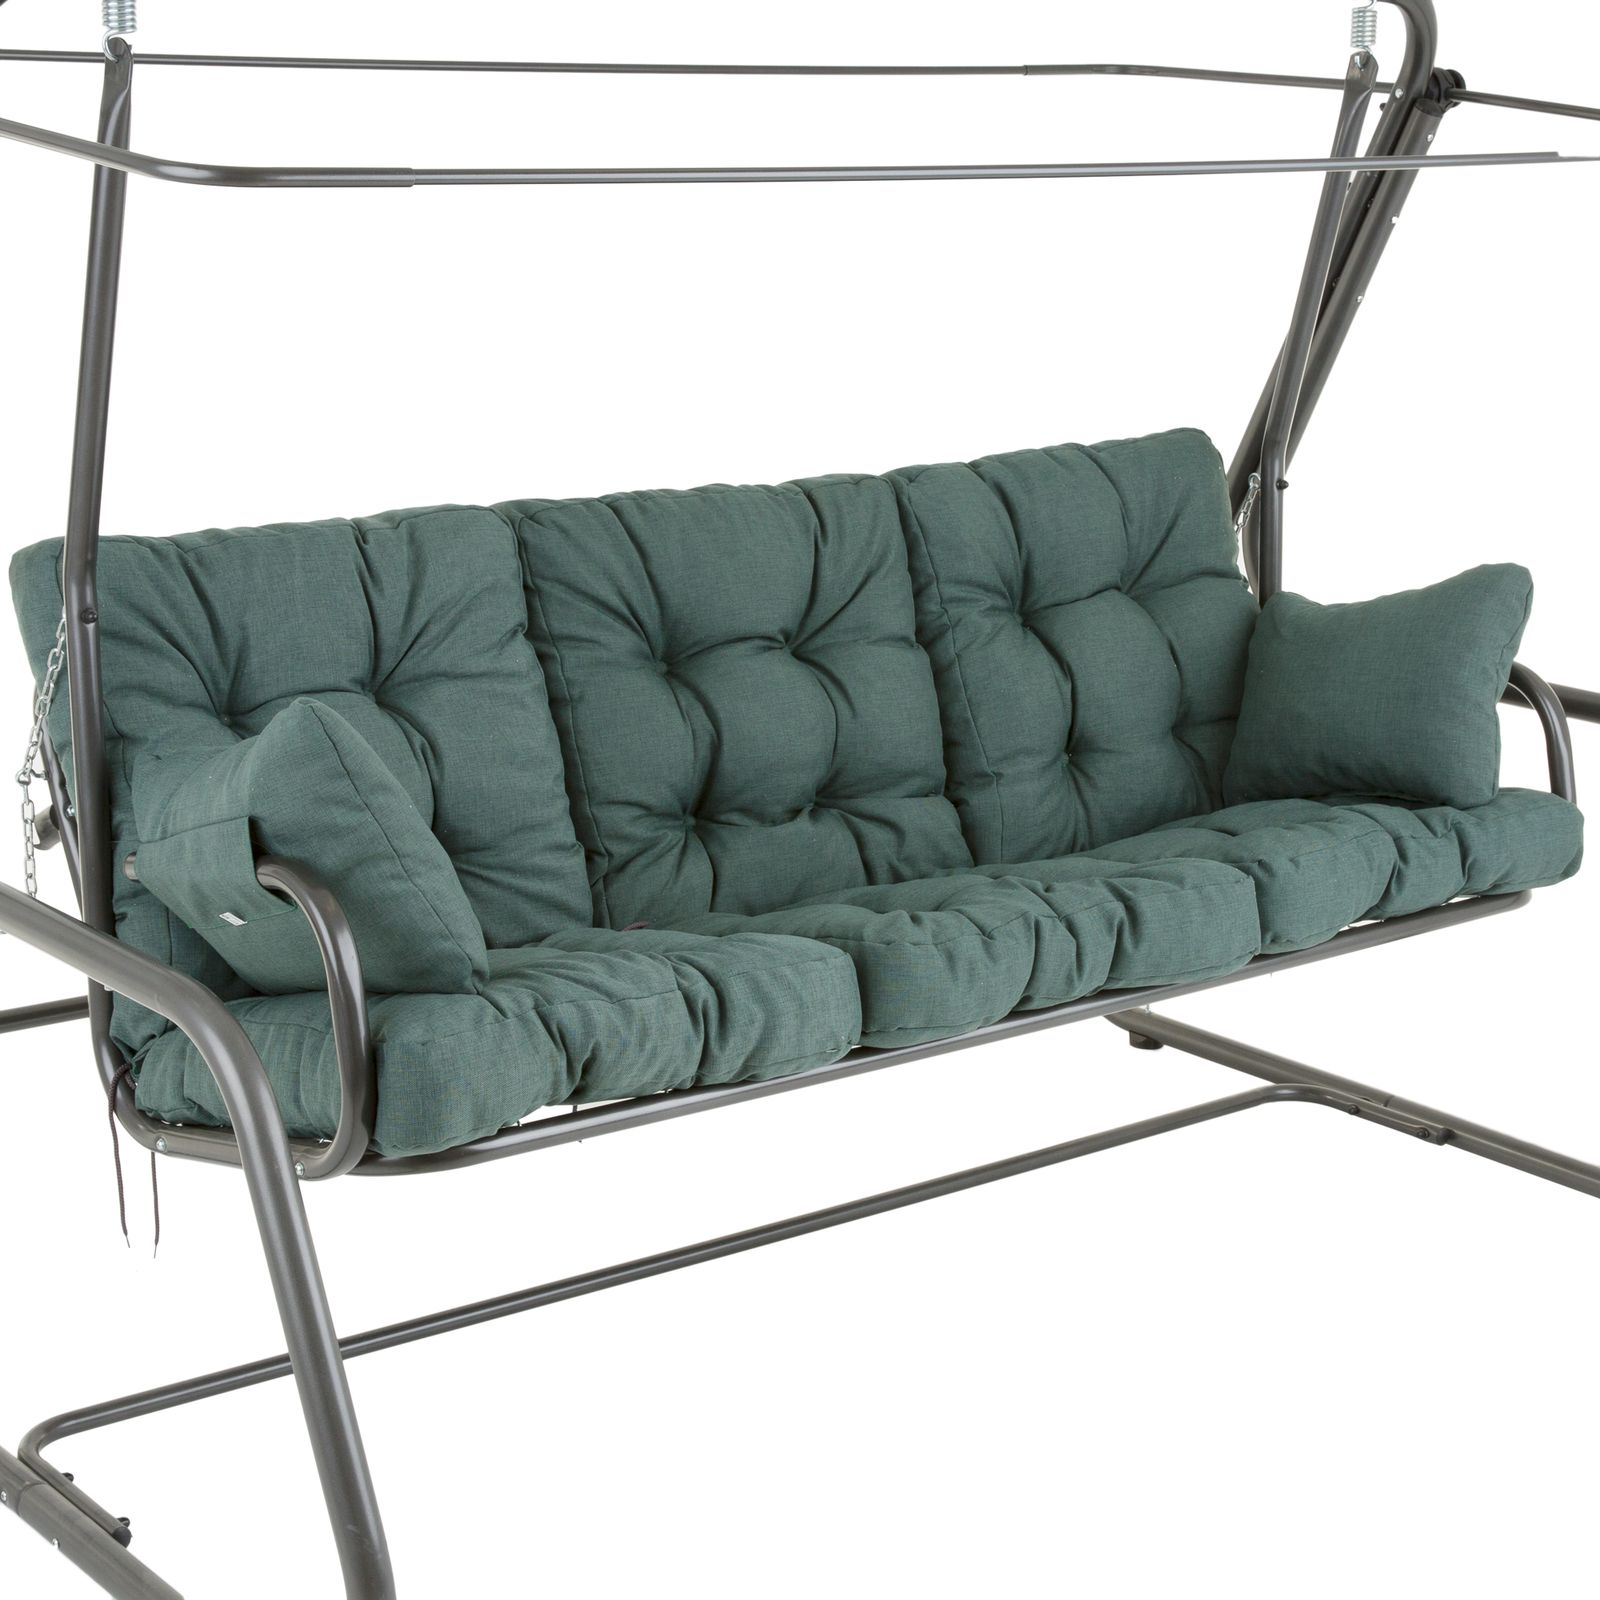 Poduszki na huśtawkę 170 cm Celebes D020-02EB PATIO